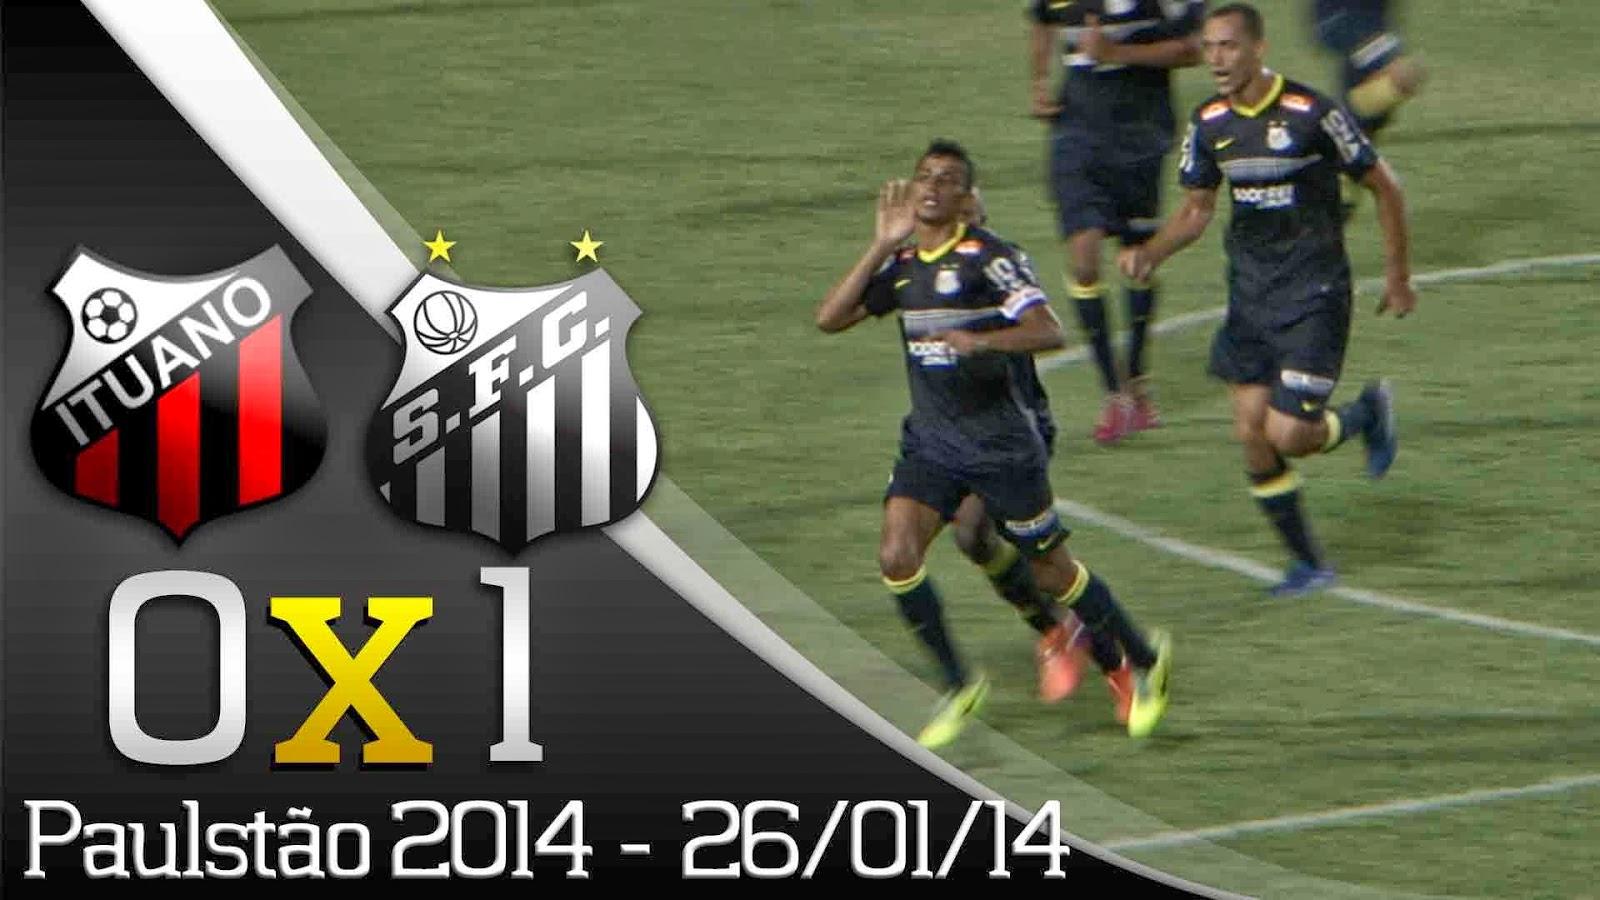 Ituano 0 x 1 Santos - 2014